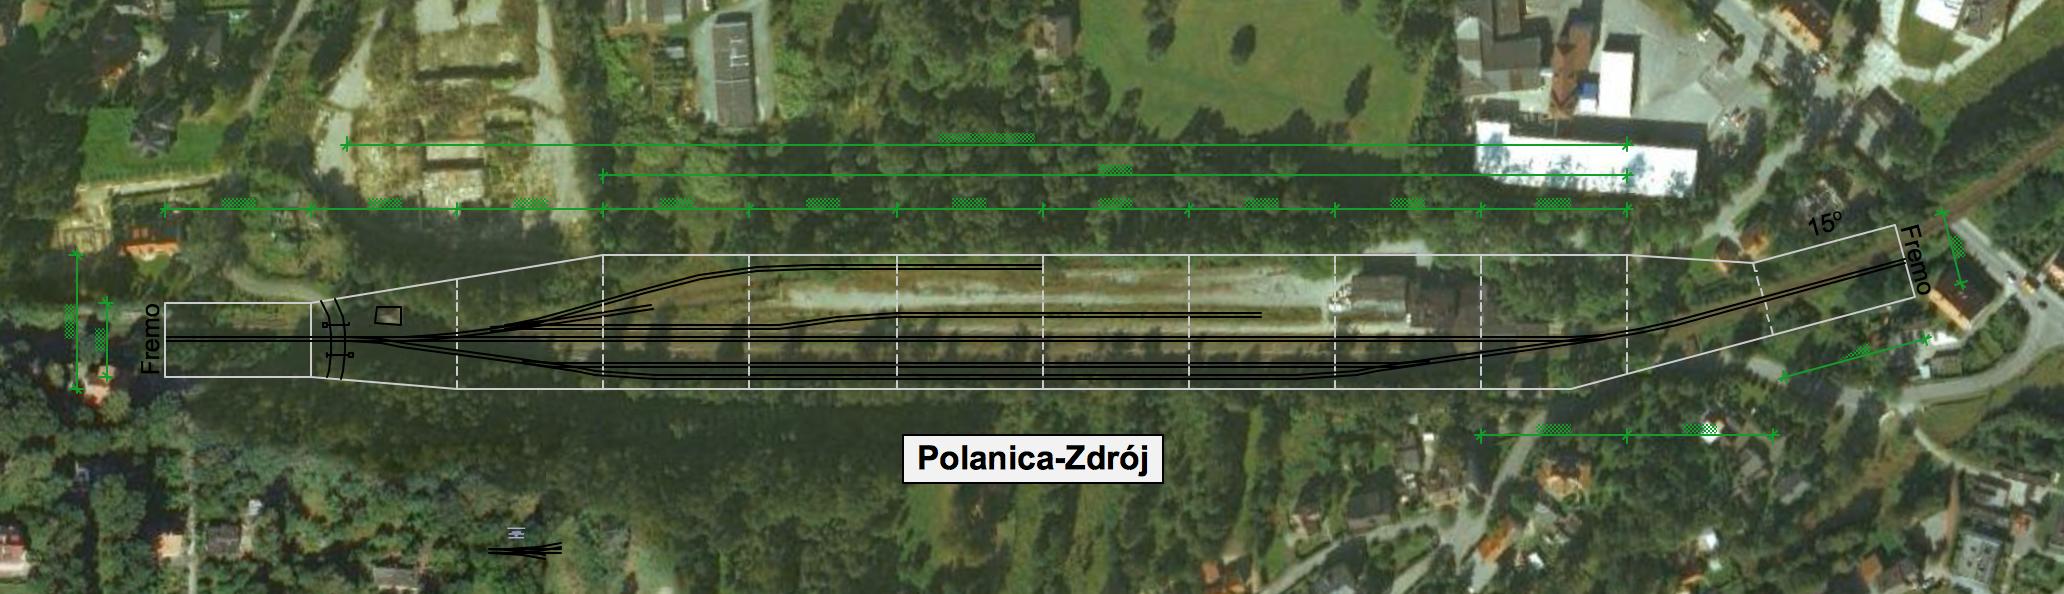 Polanica google.png